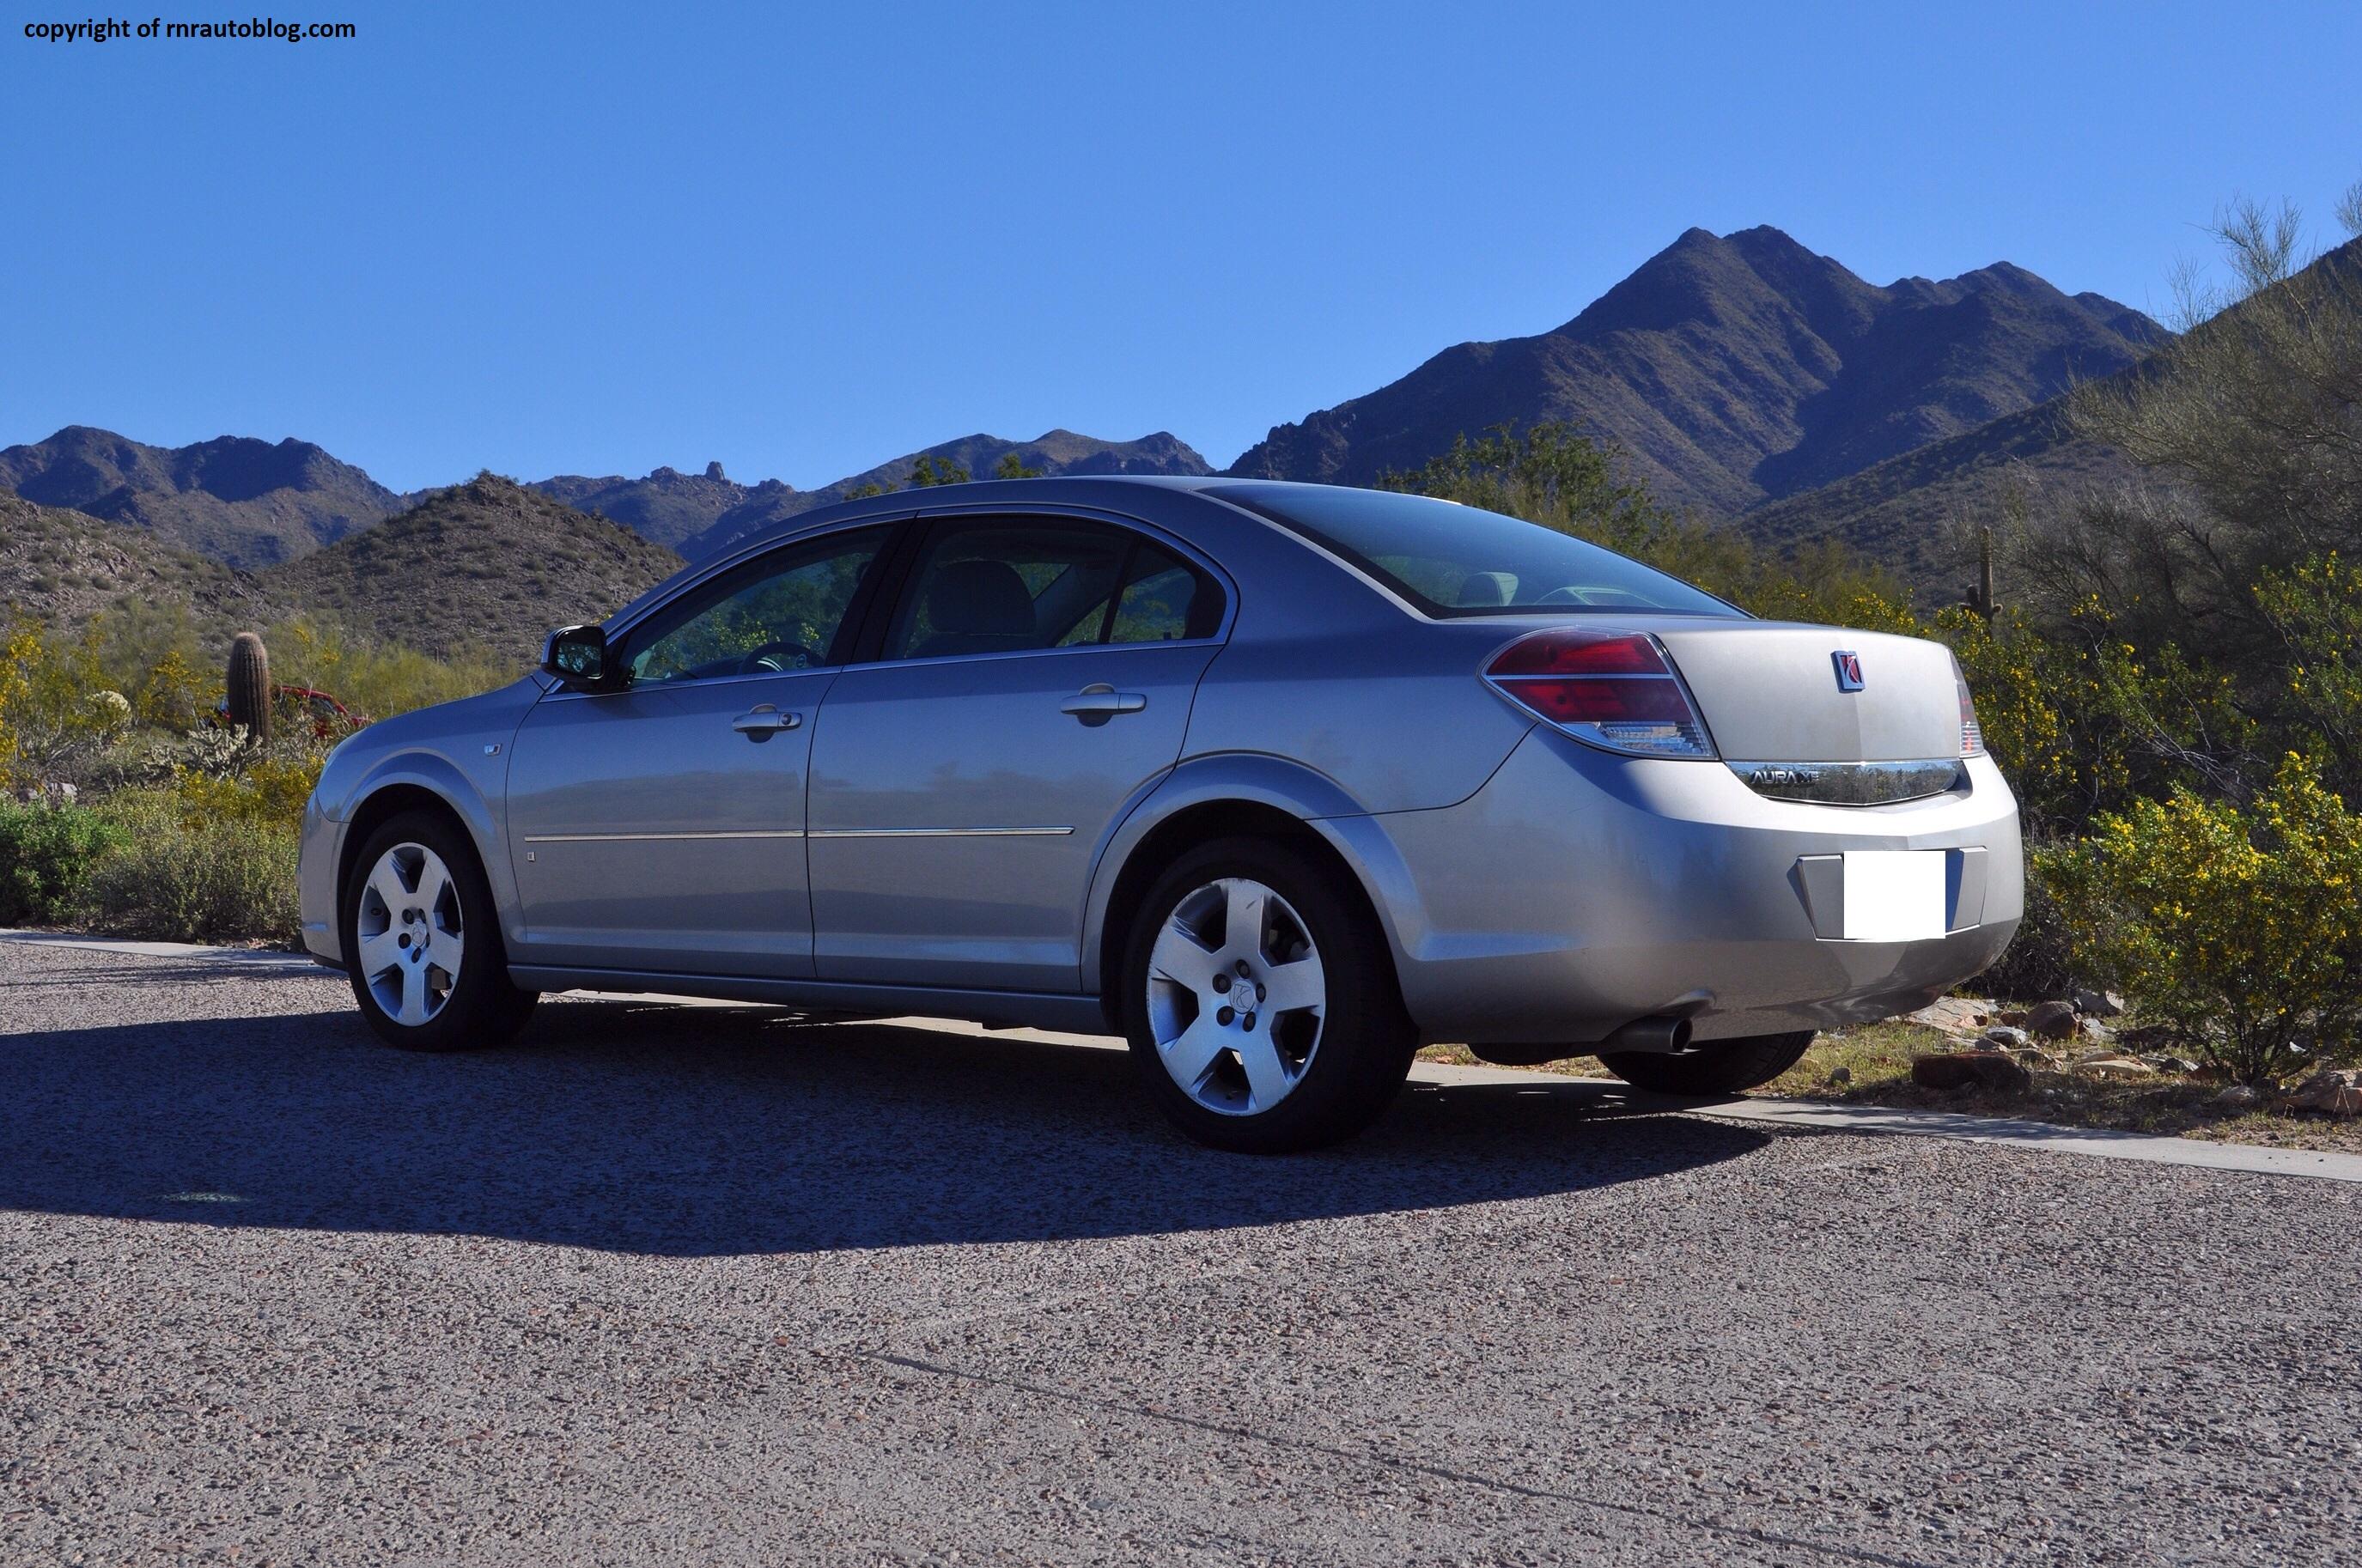 Saturn Aura Review >> 2007 Saturn Aura XE Review | RNR Automotive Blog